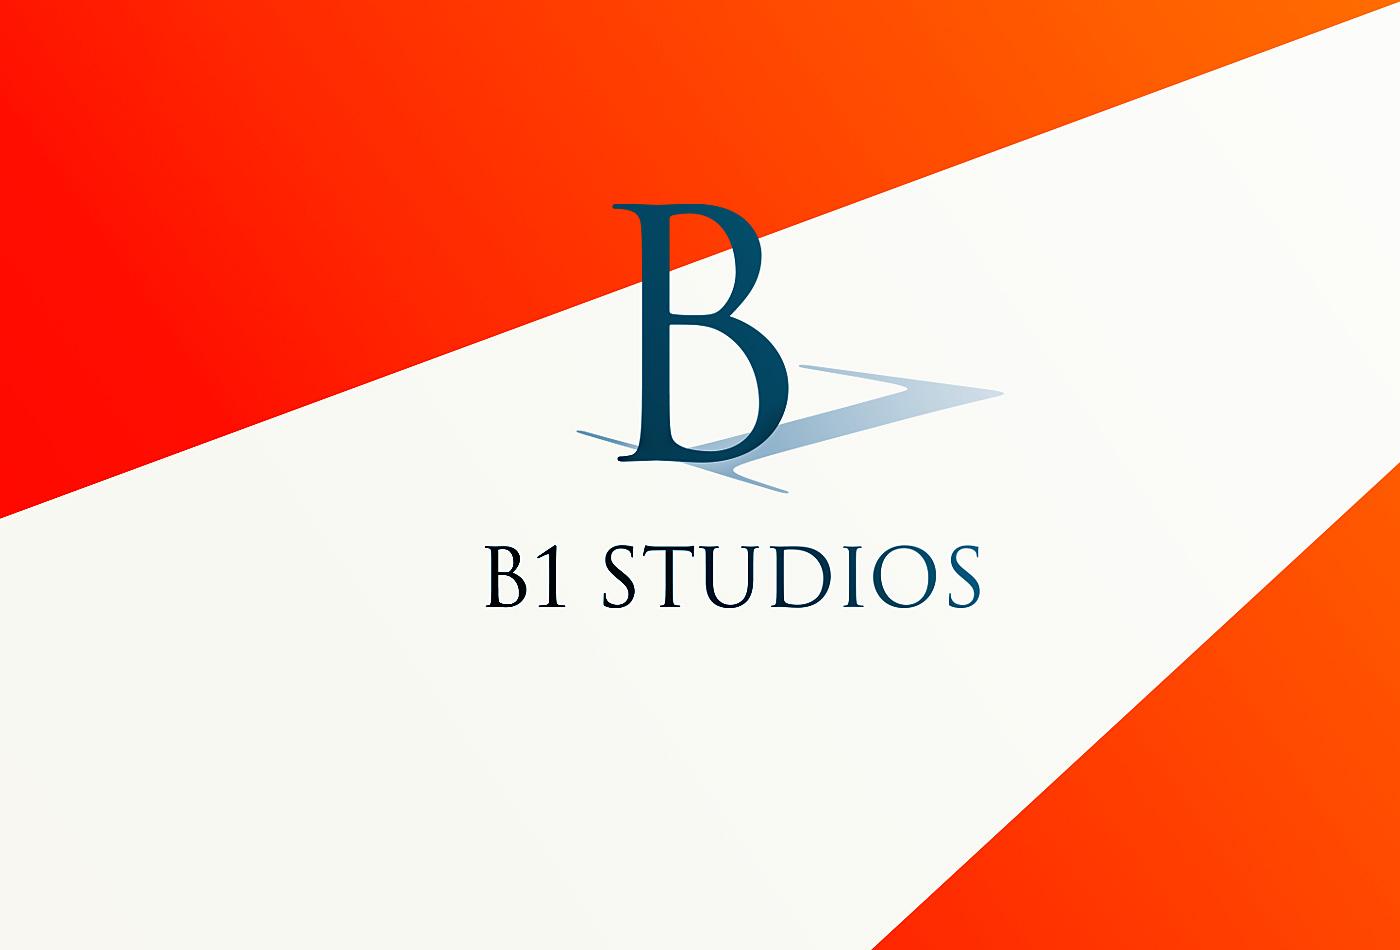 B1-Studios